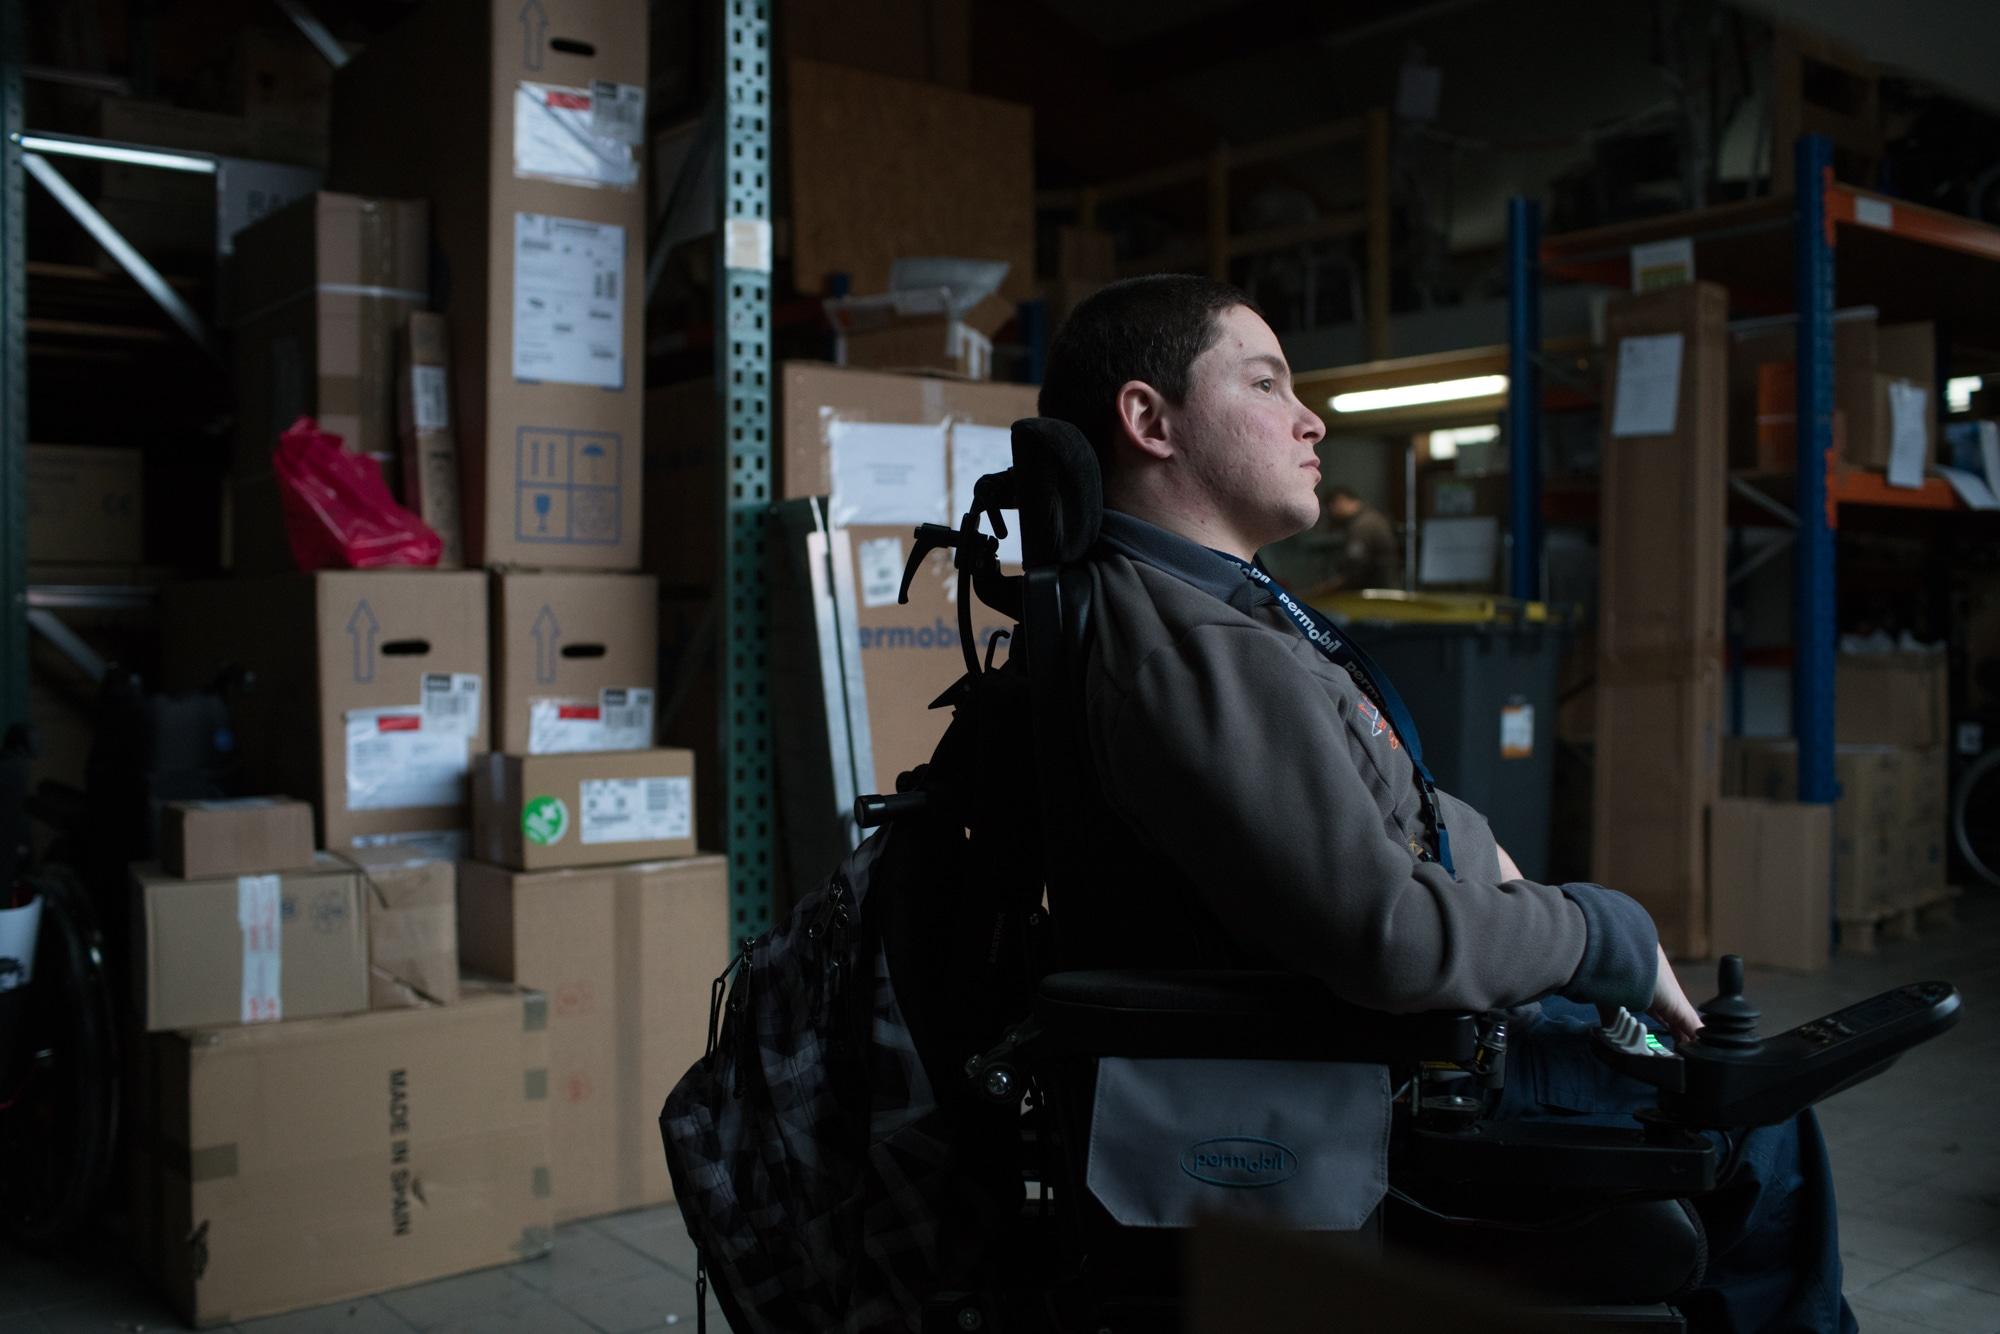 Edouard, pensif, de profil dans l'entrepôt